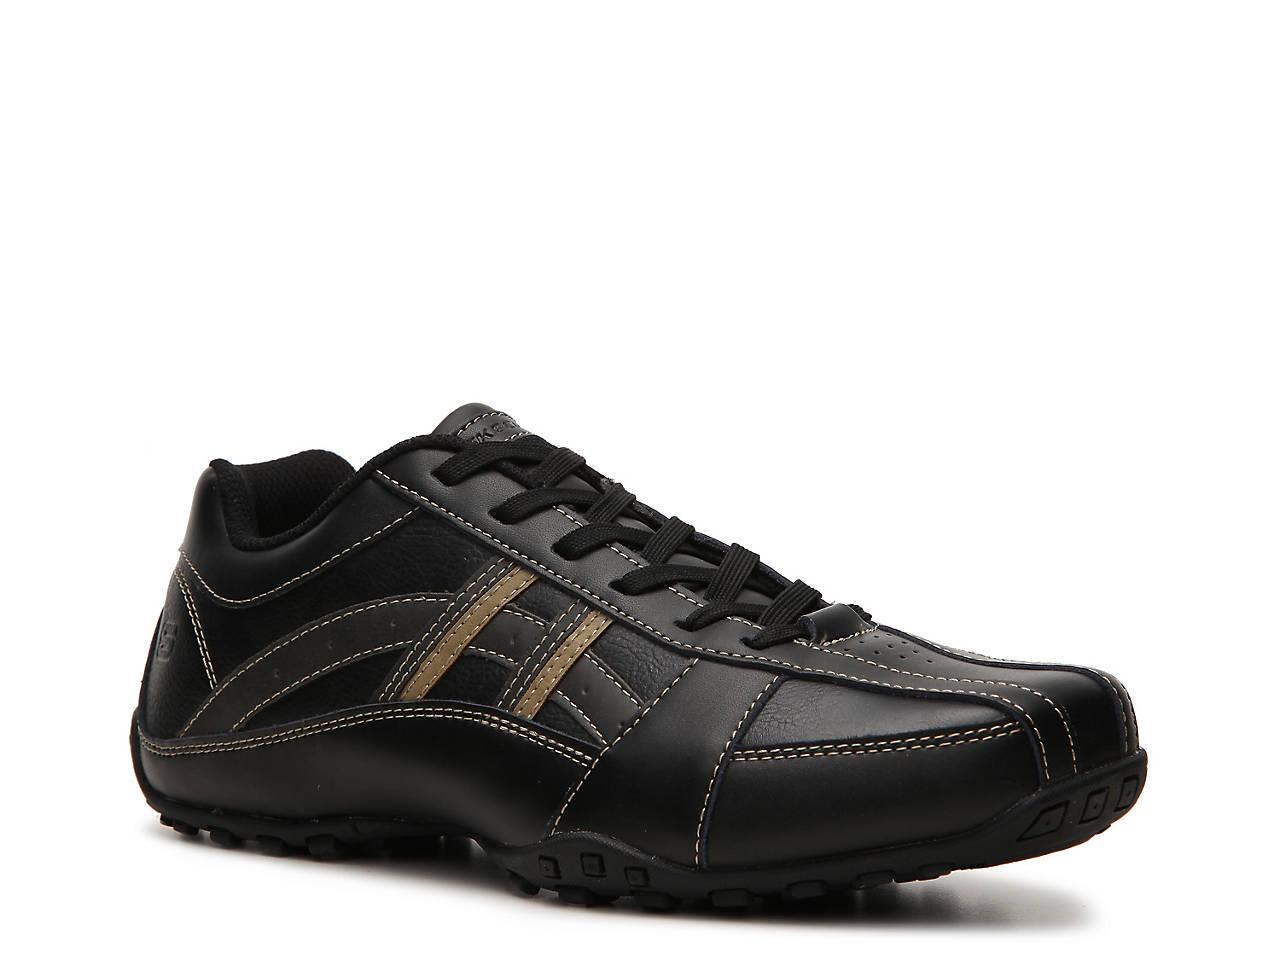 c4116ba6e4db Skechers Citywalk Malton Sneaker Men s Shoes